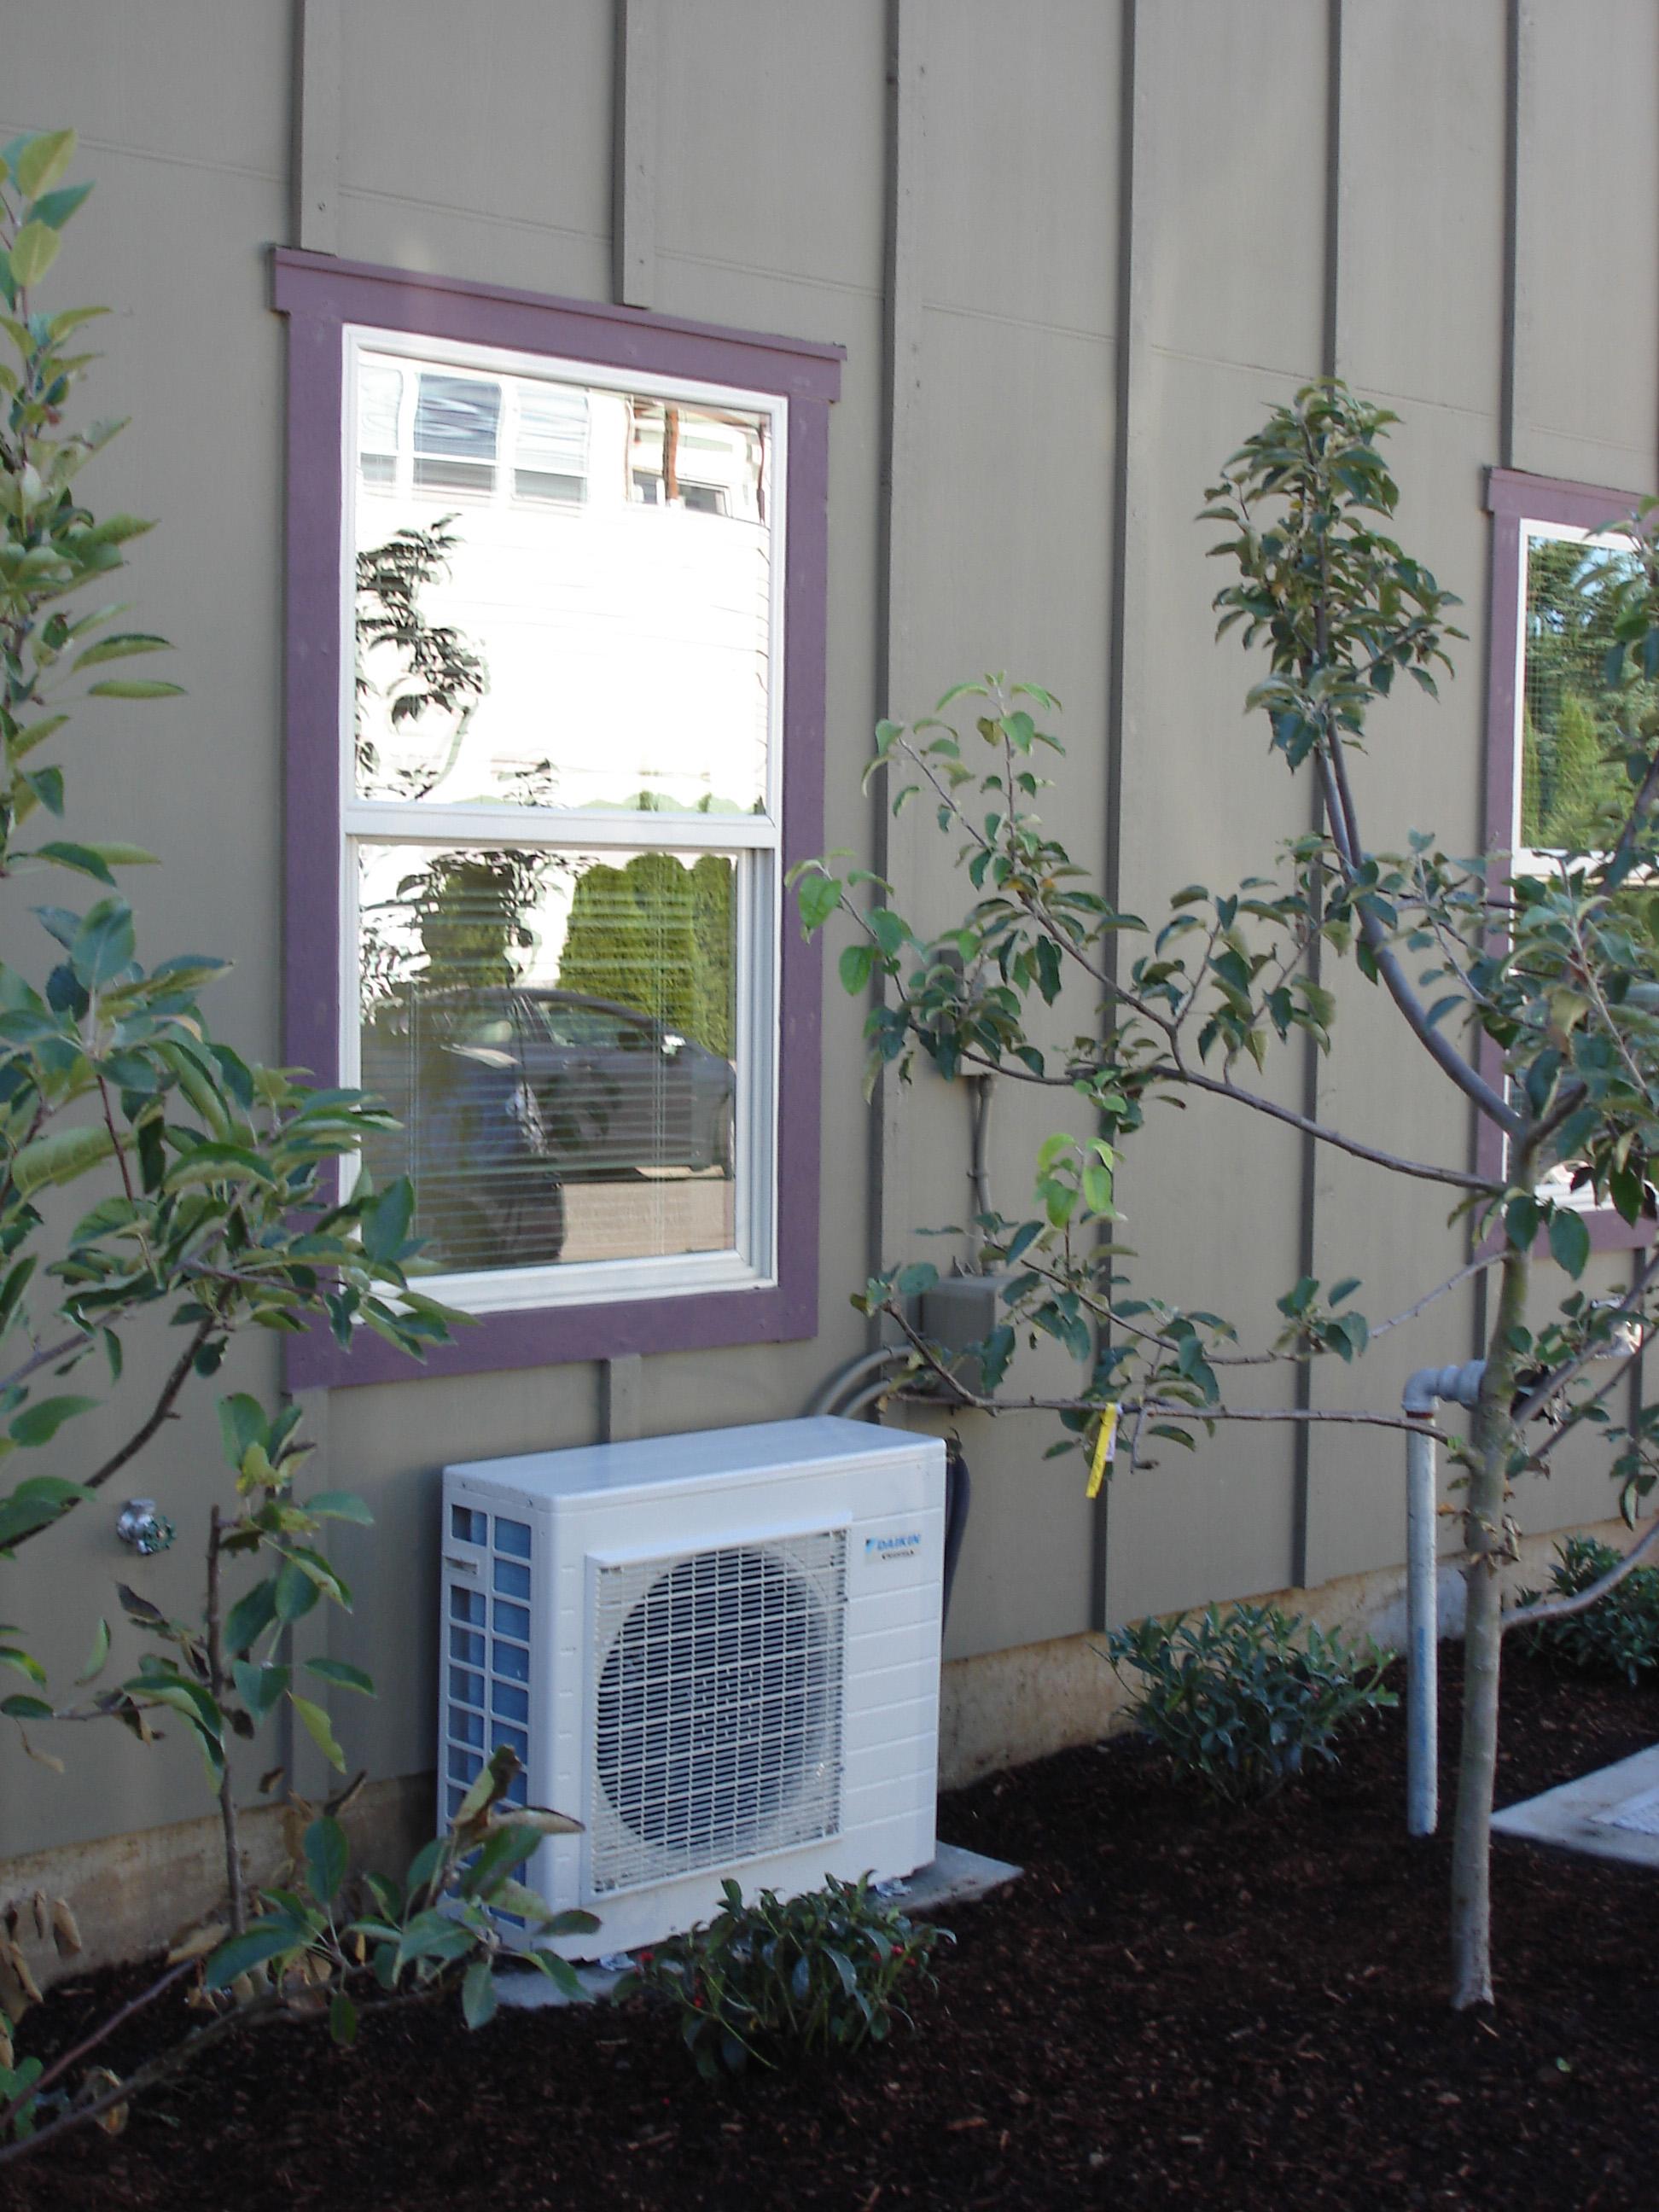 hight resolution of still no word on 2015 high efficiency furnace heat pump federal tax credits